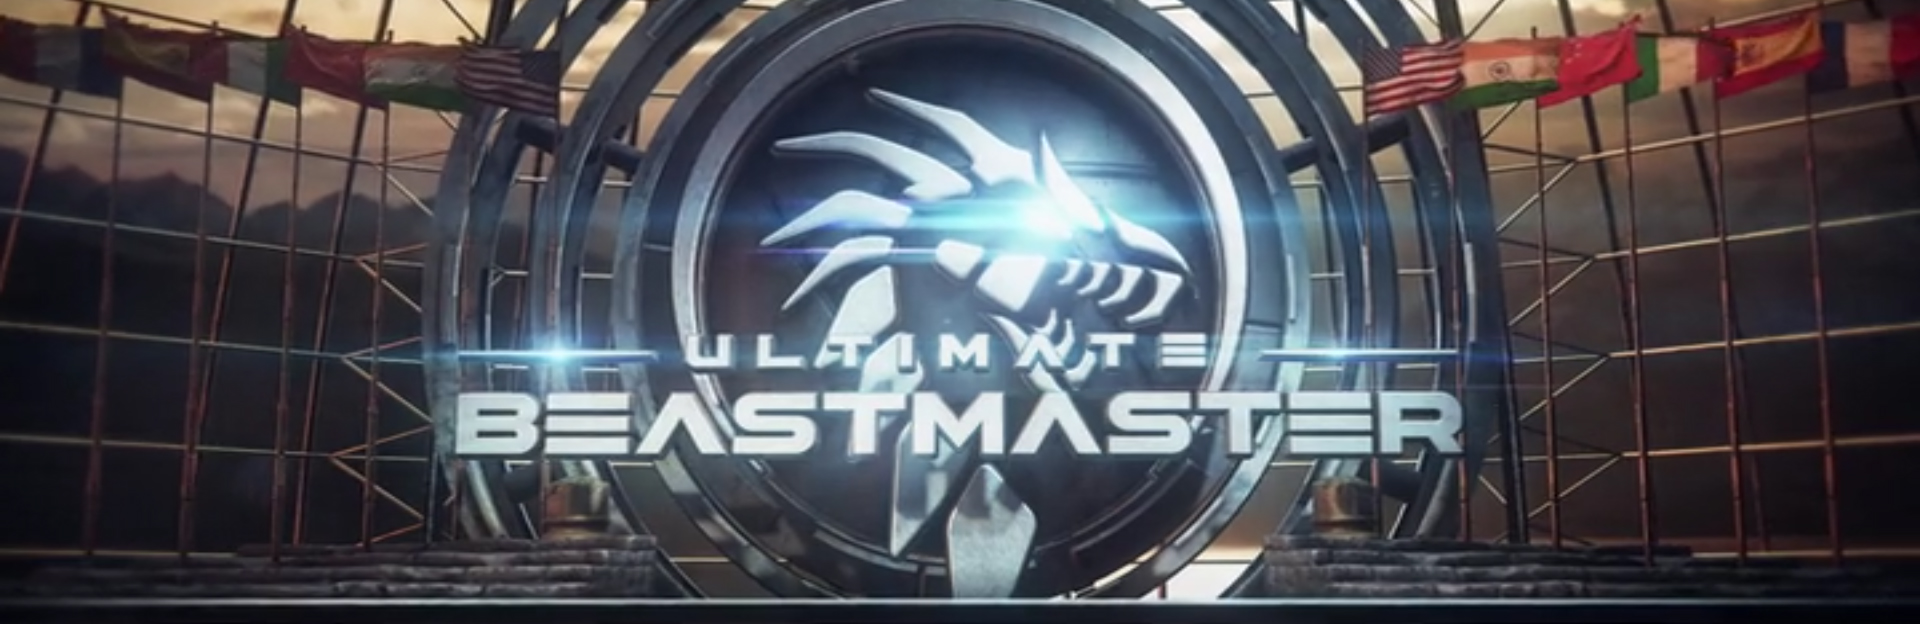 Ultimate Beastmaster Season 2